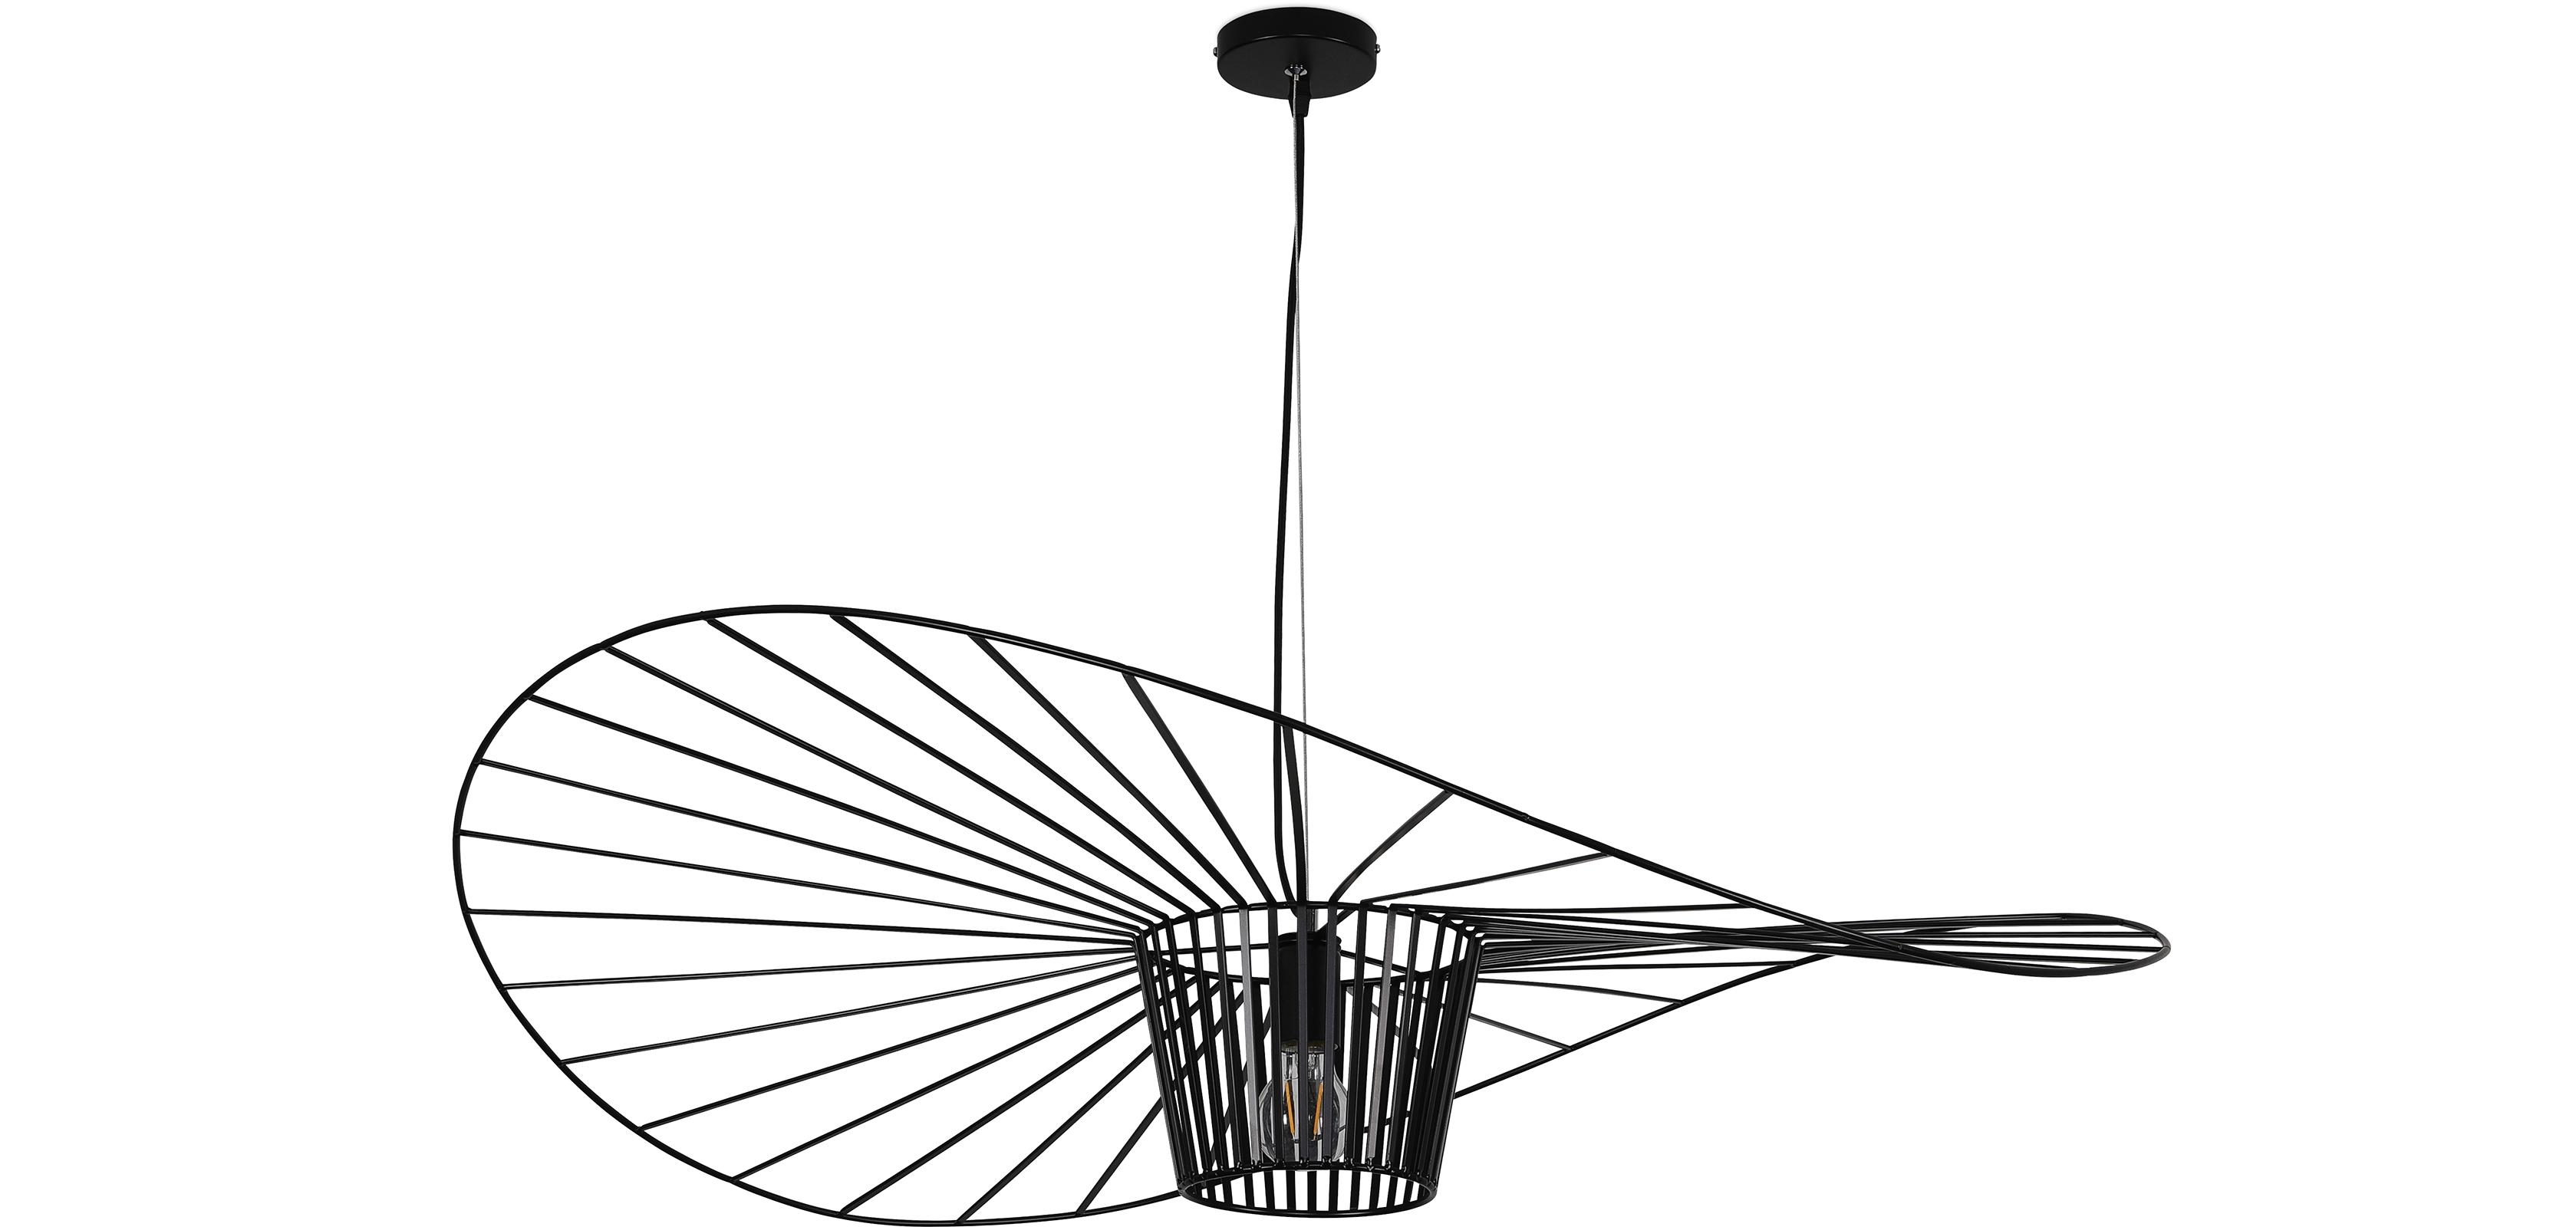 Buy Hanging Lamp Vertice - Metal - 100cm Black 59905 - in the UK